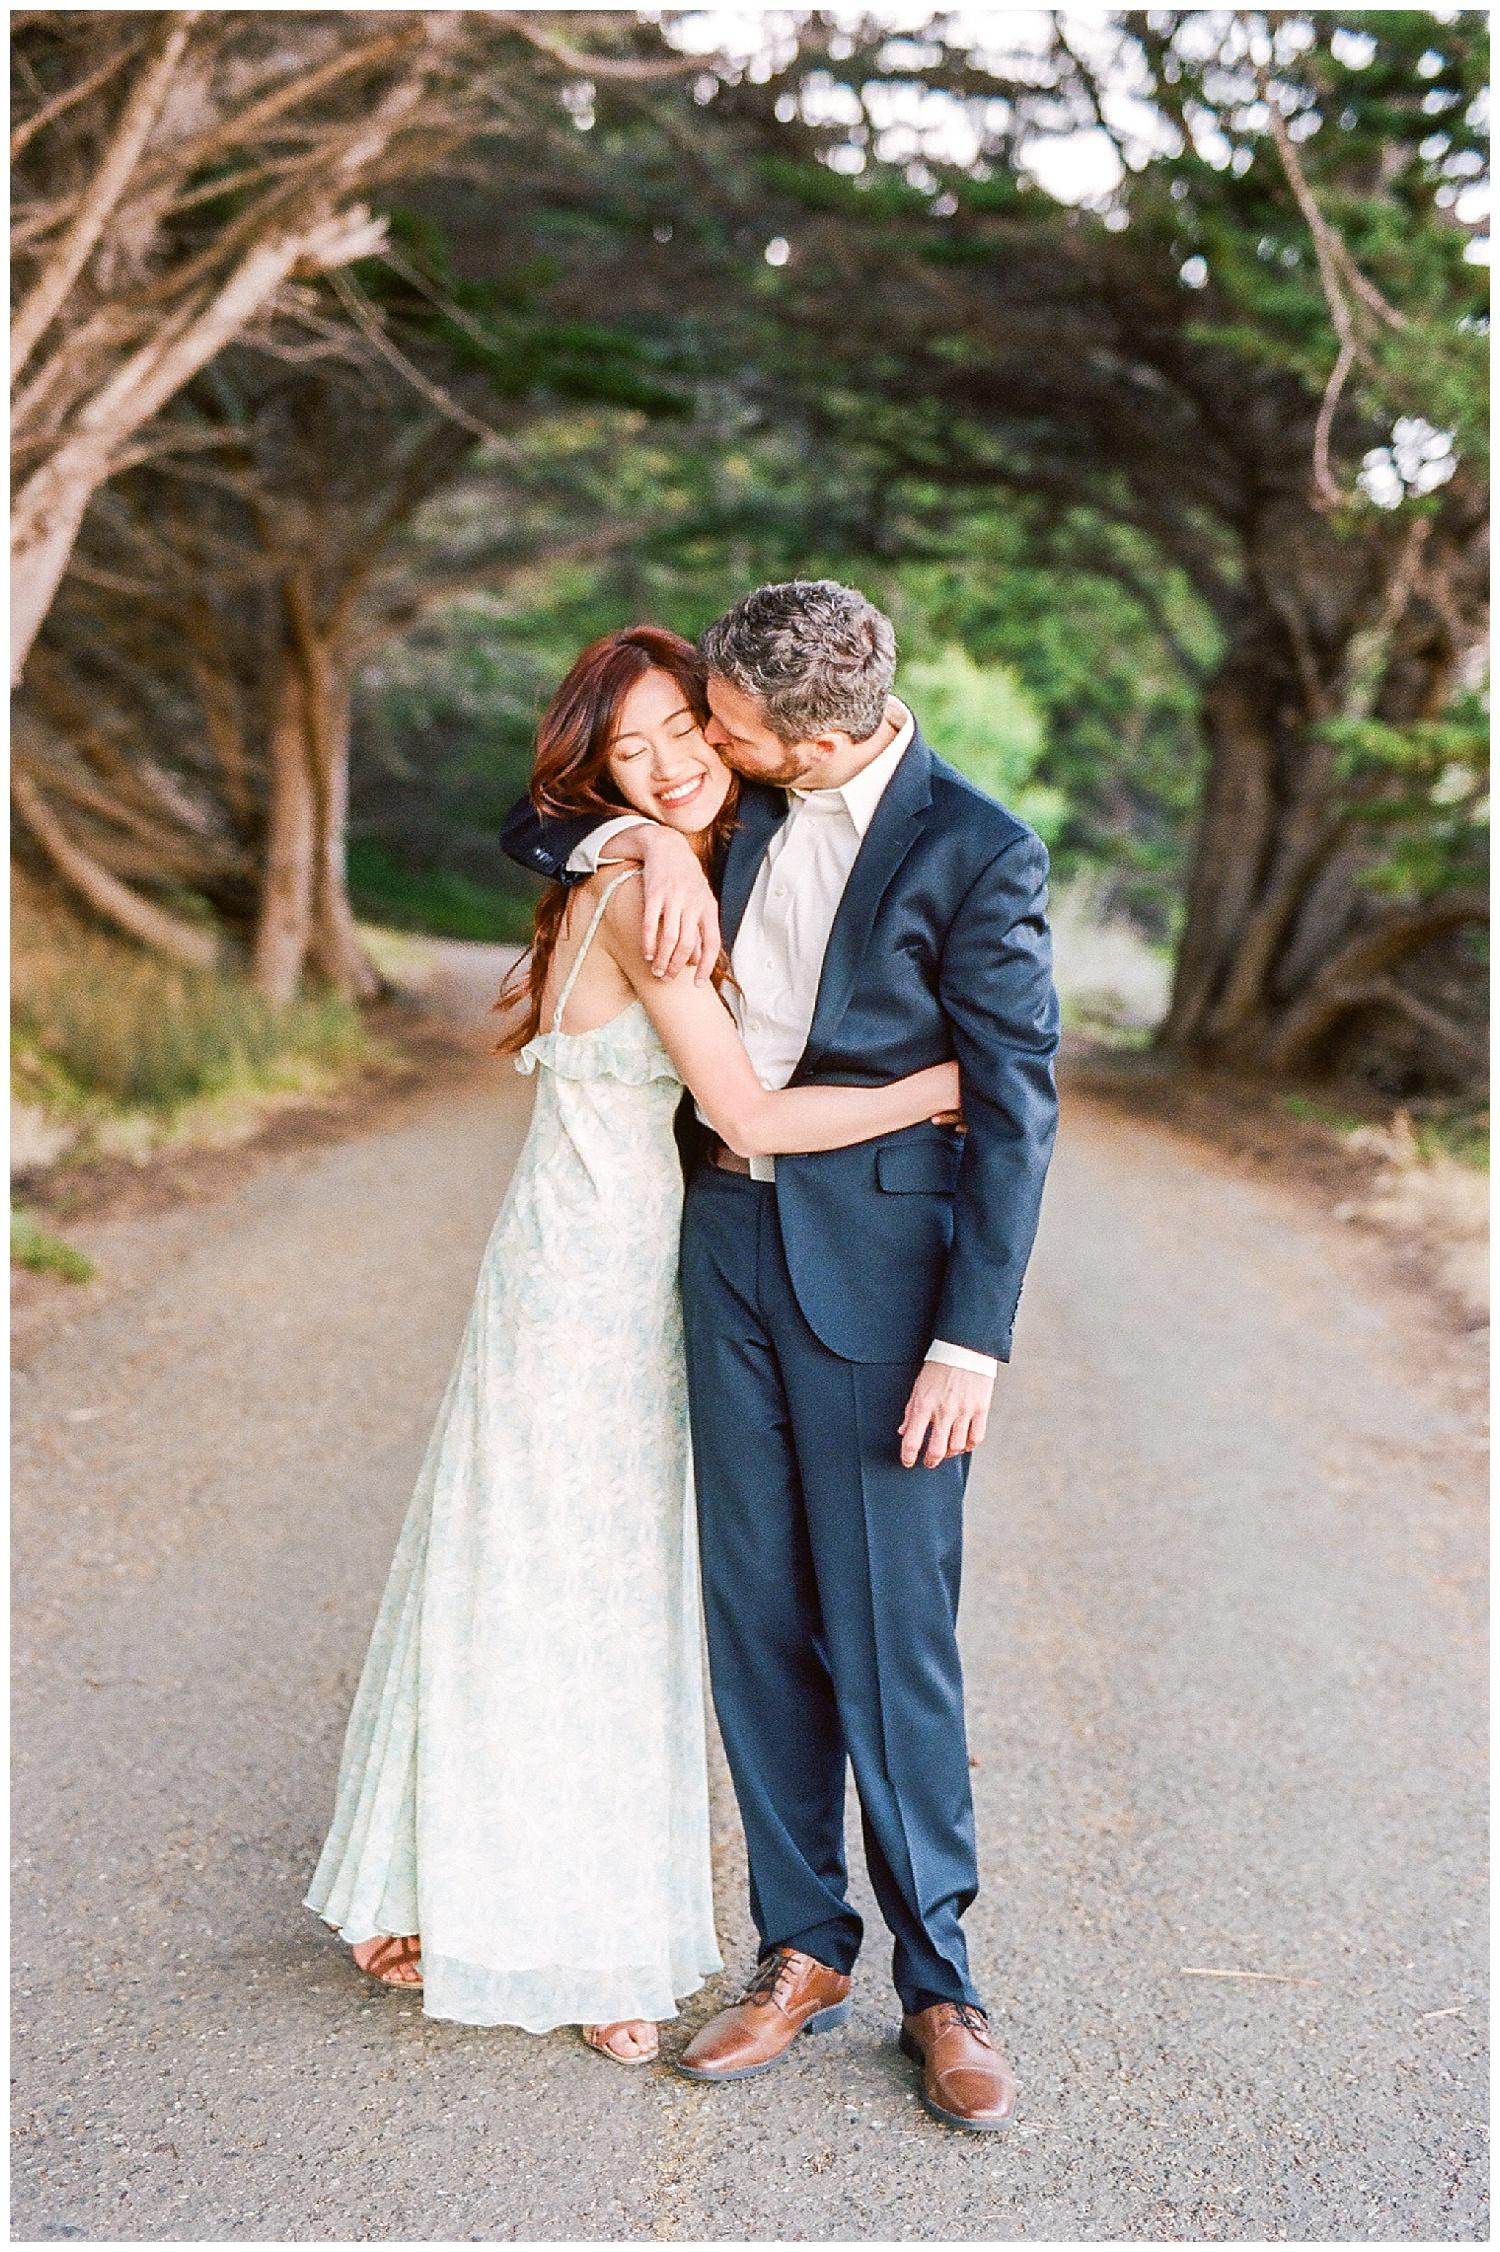 Janine_Licare_Photography_San_Francisco_Wedding_Photographer_0021.jpg